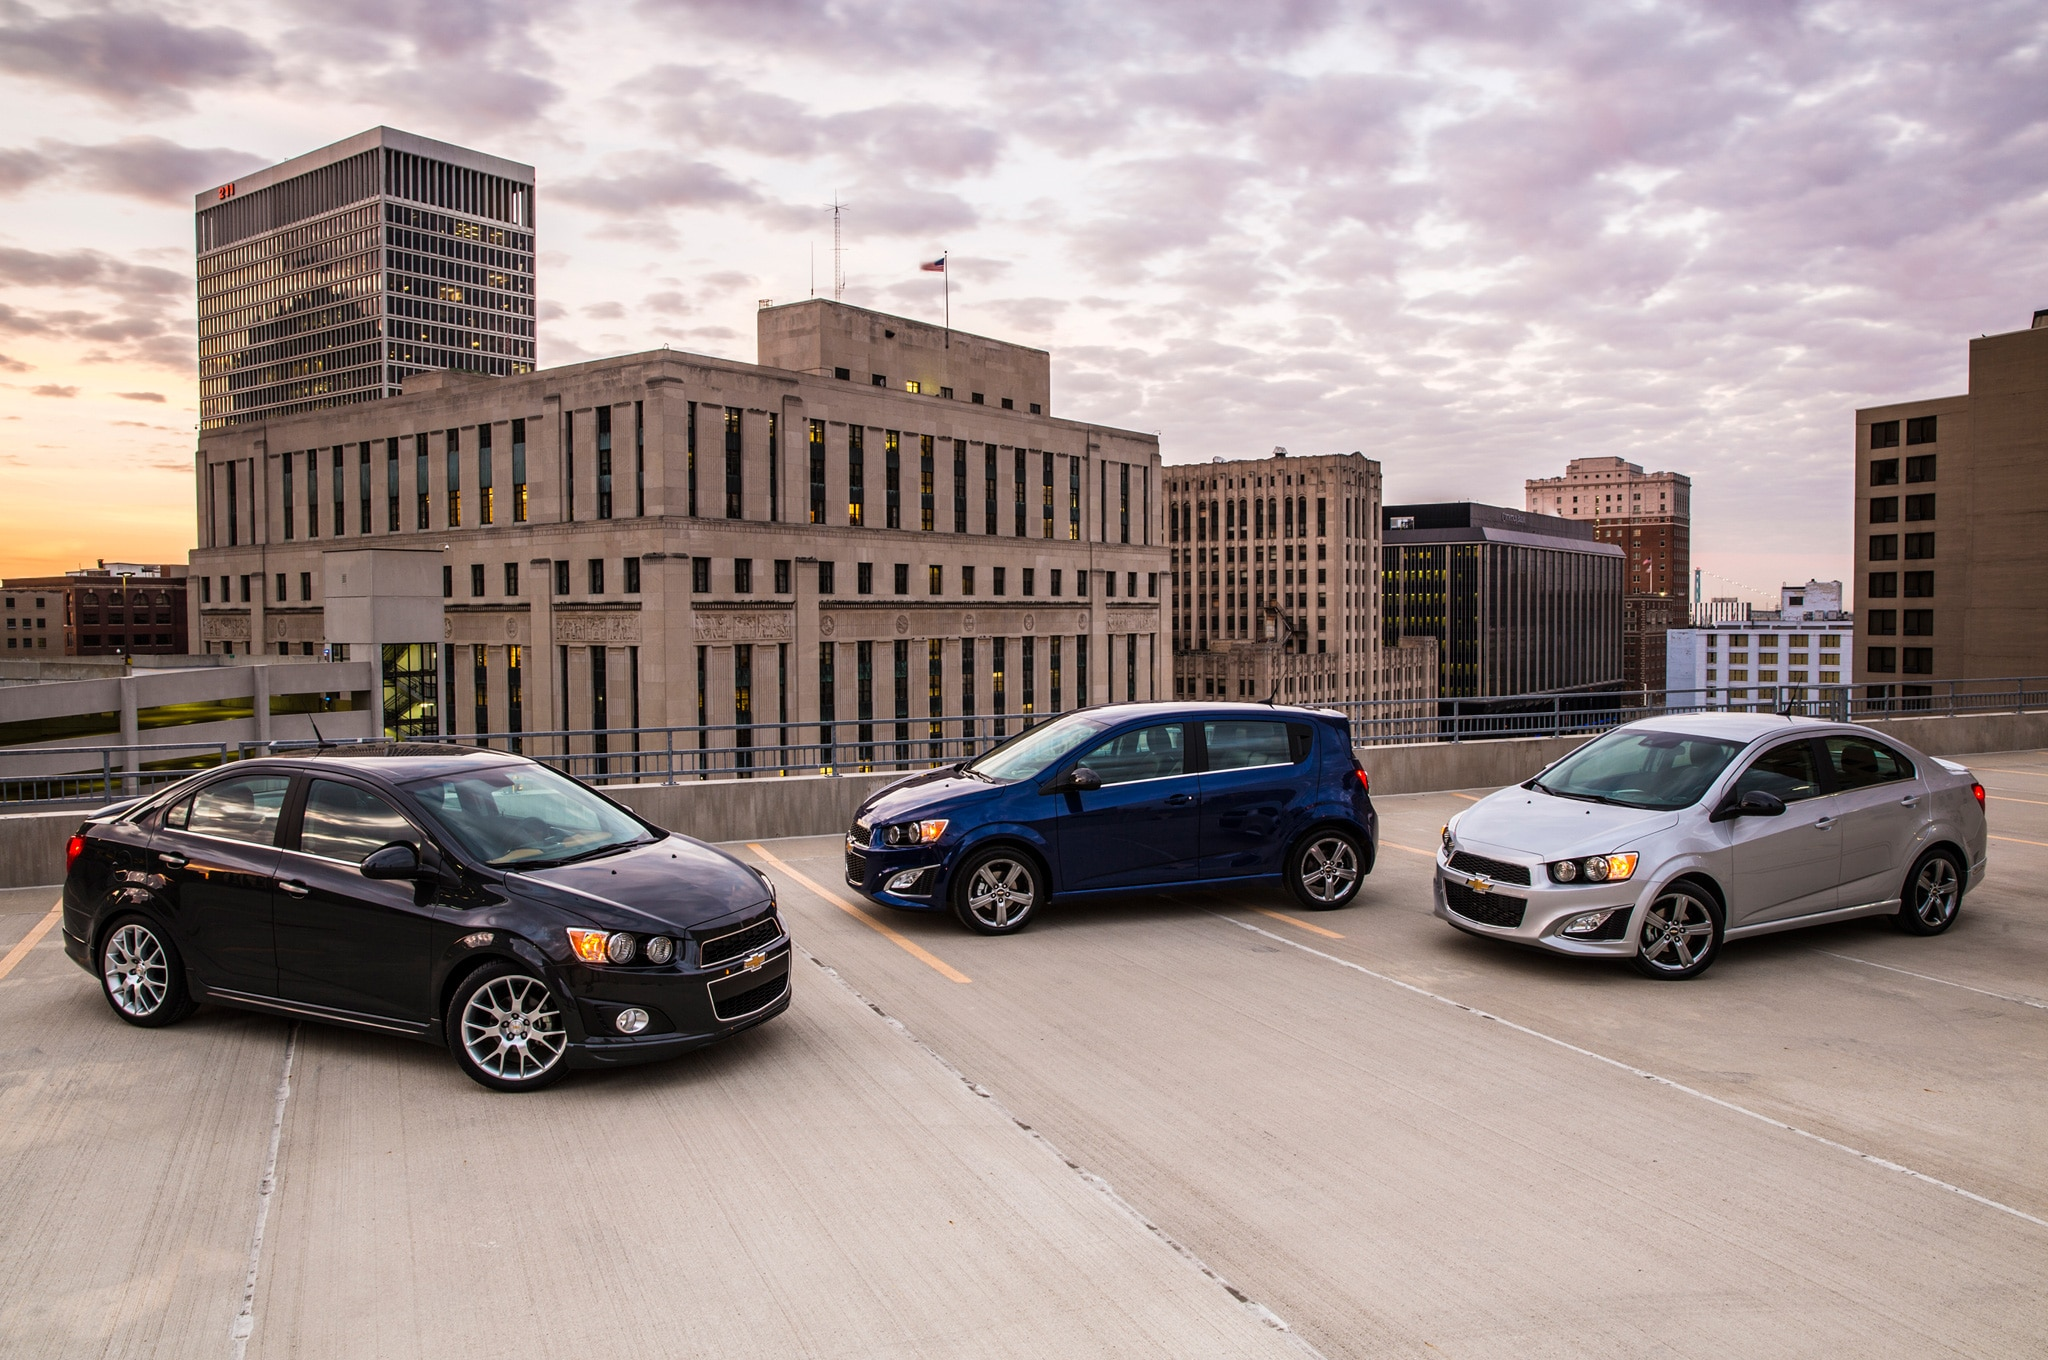 2014 Chevrolet Sonic Lineup1